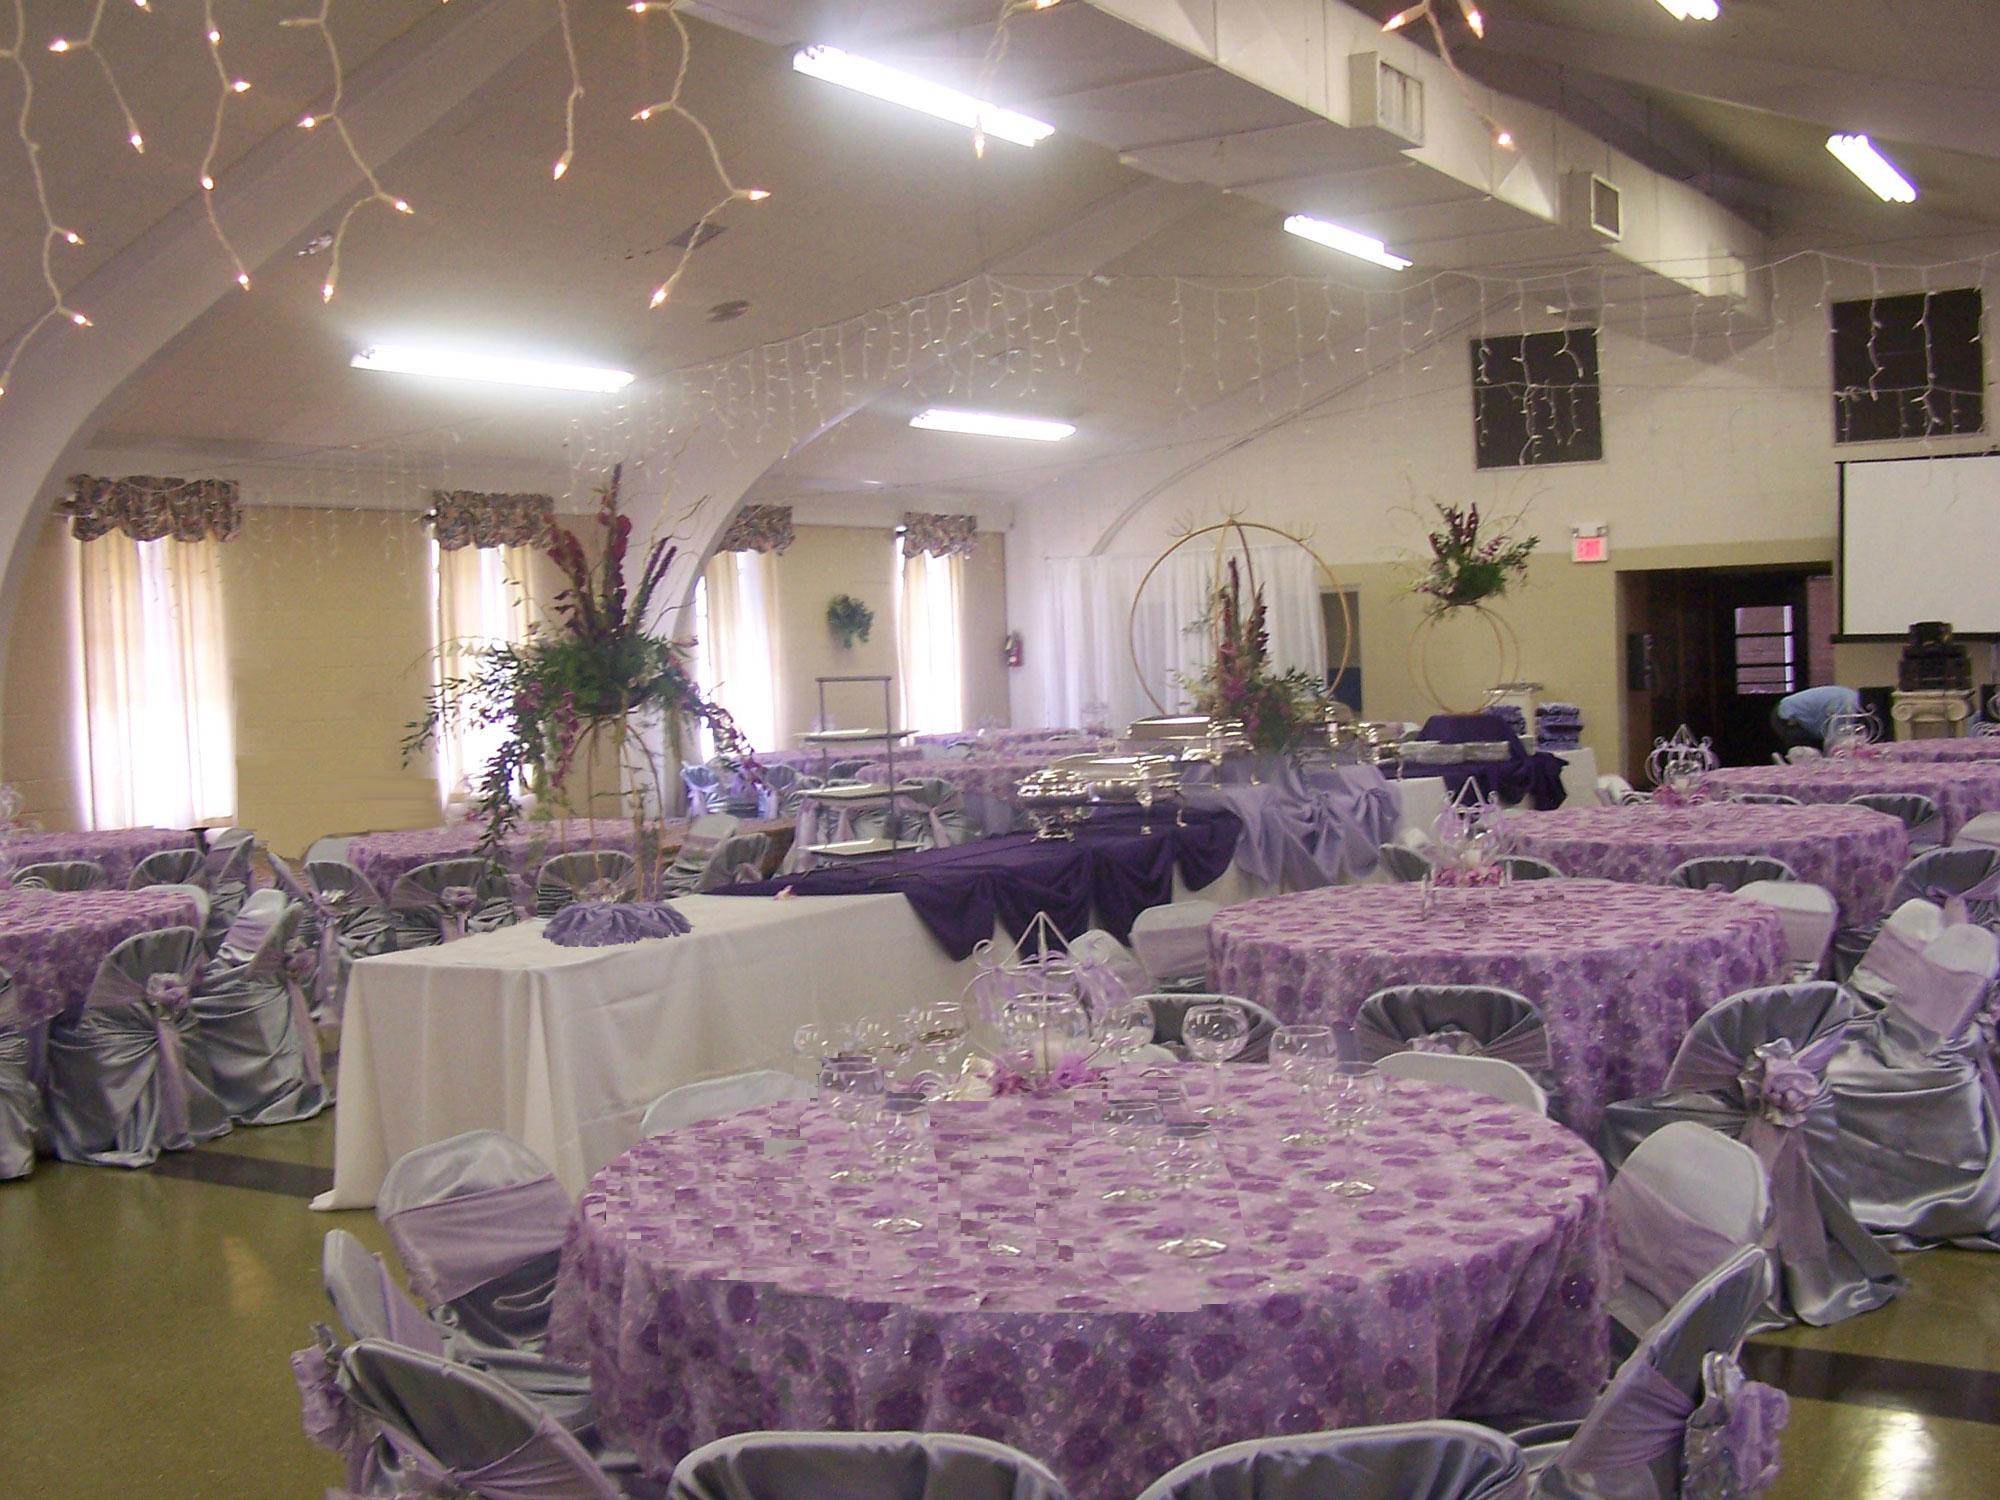 Banquet Rooms For Rent Delaware